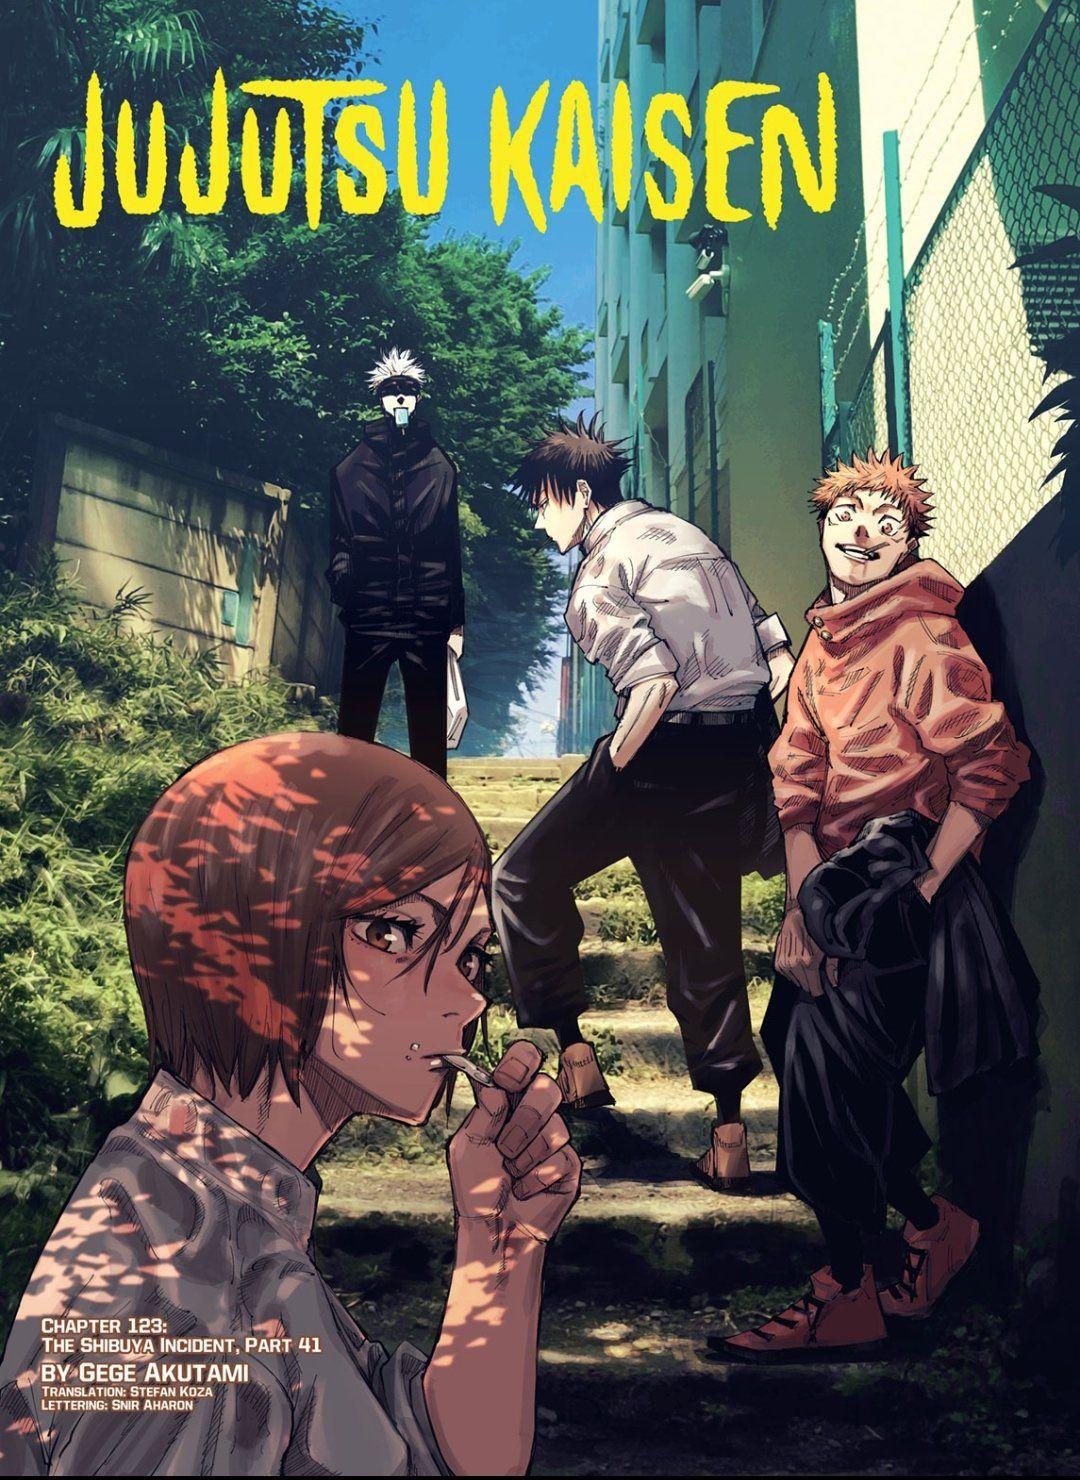 Anime Shot On Twitter In 2021 Jujutsu Manga Covers Anime